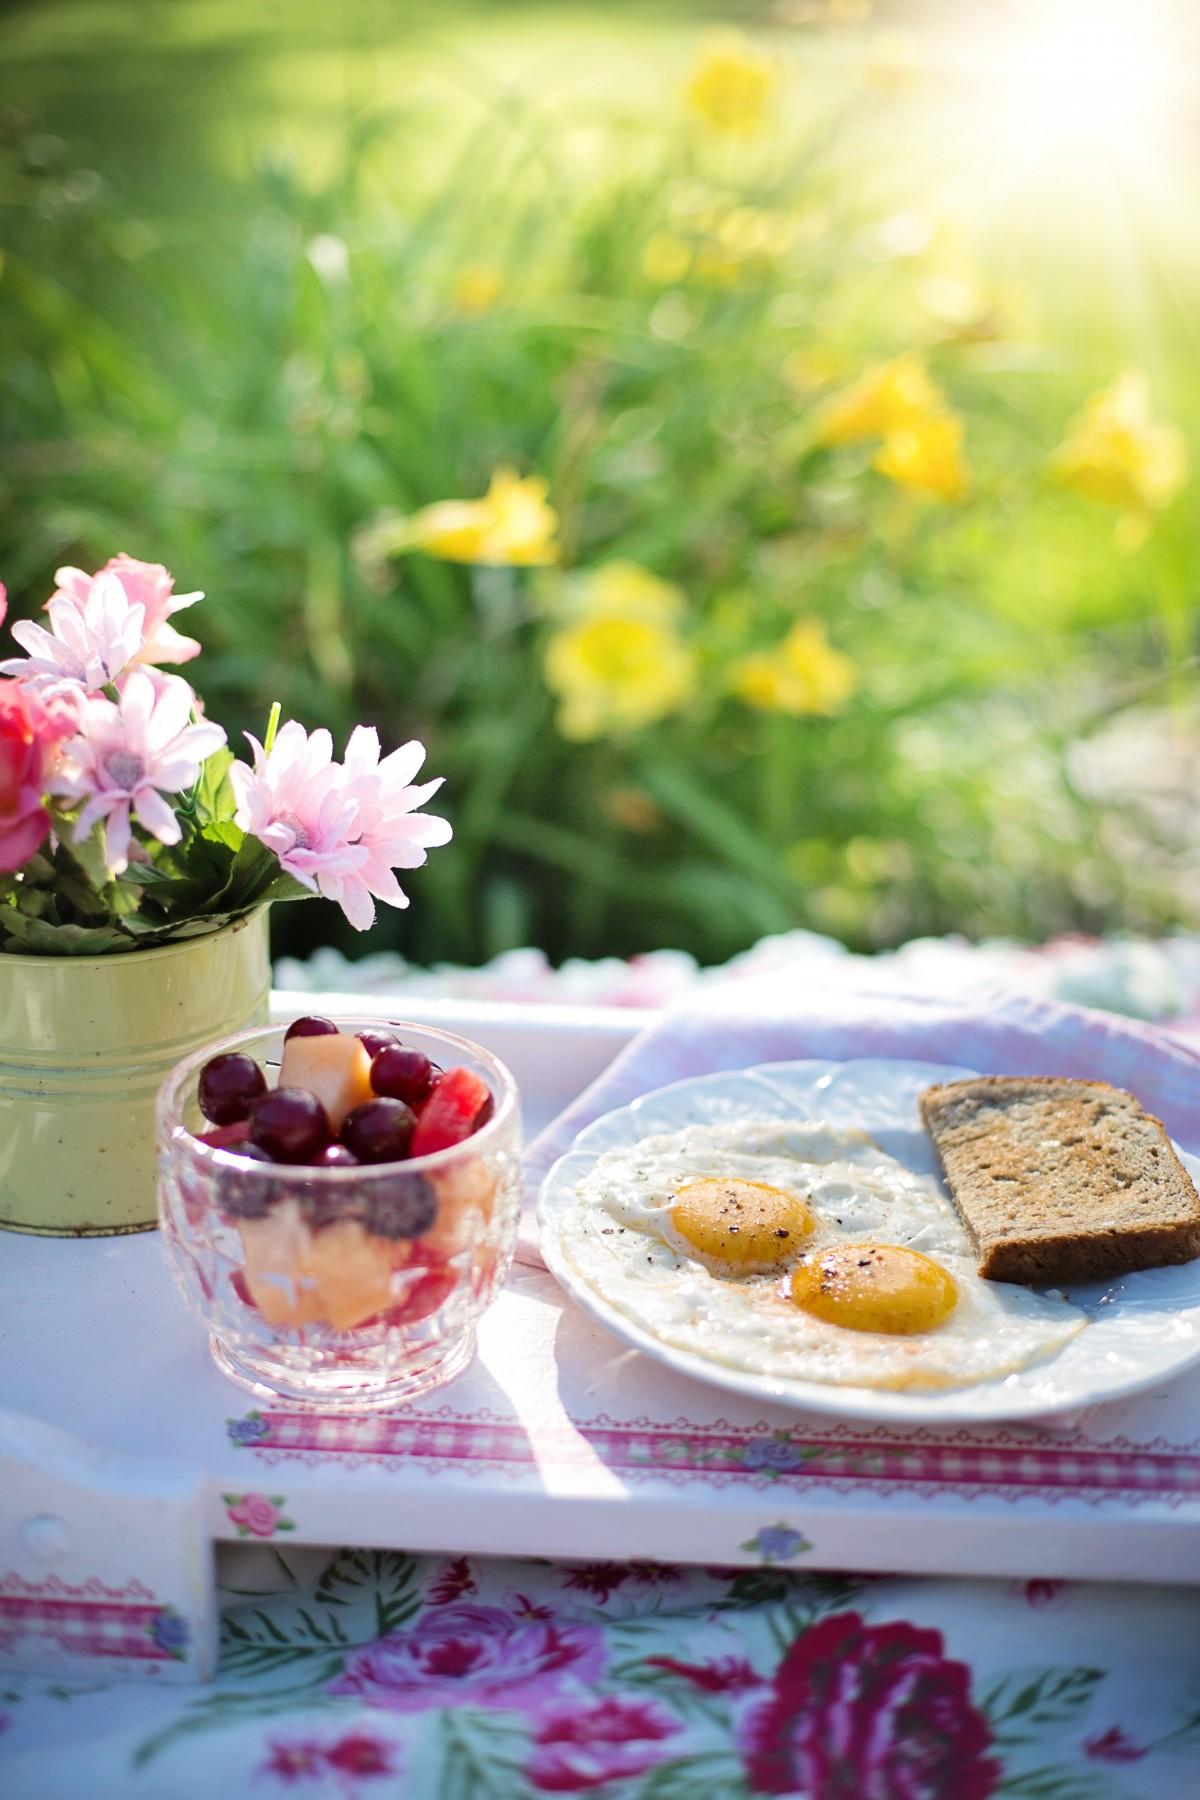 Посудой, картинки утро завтрак лето